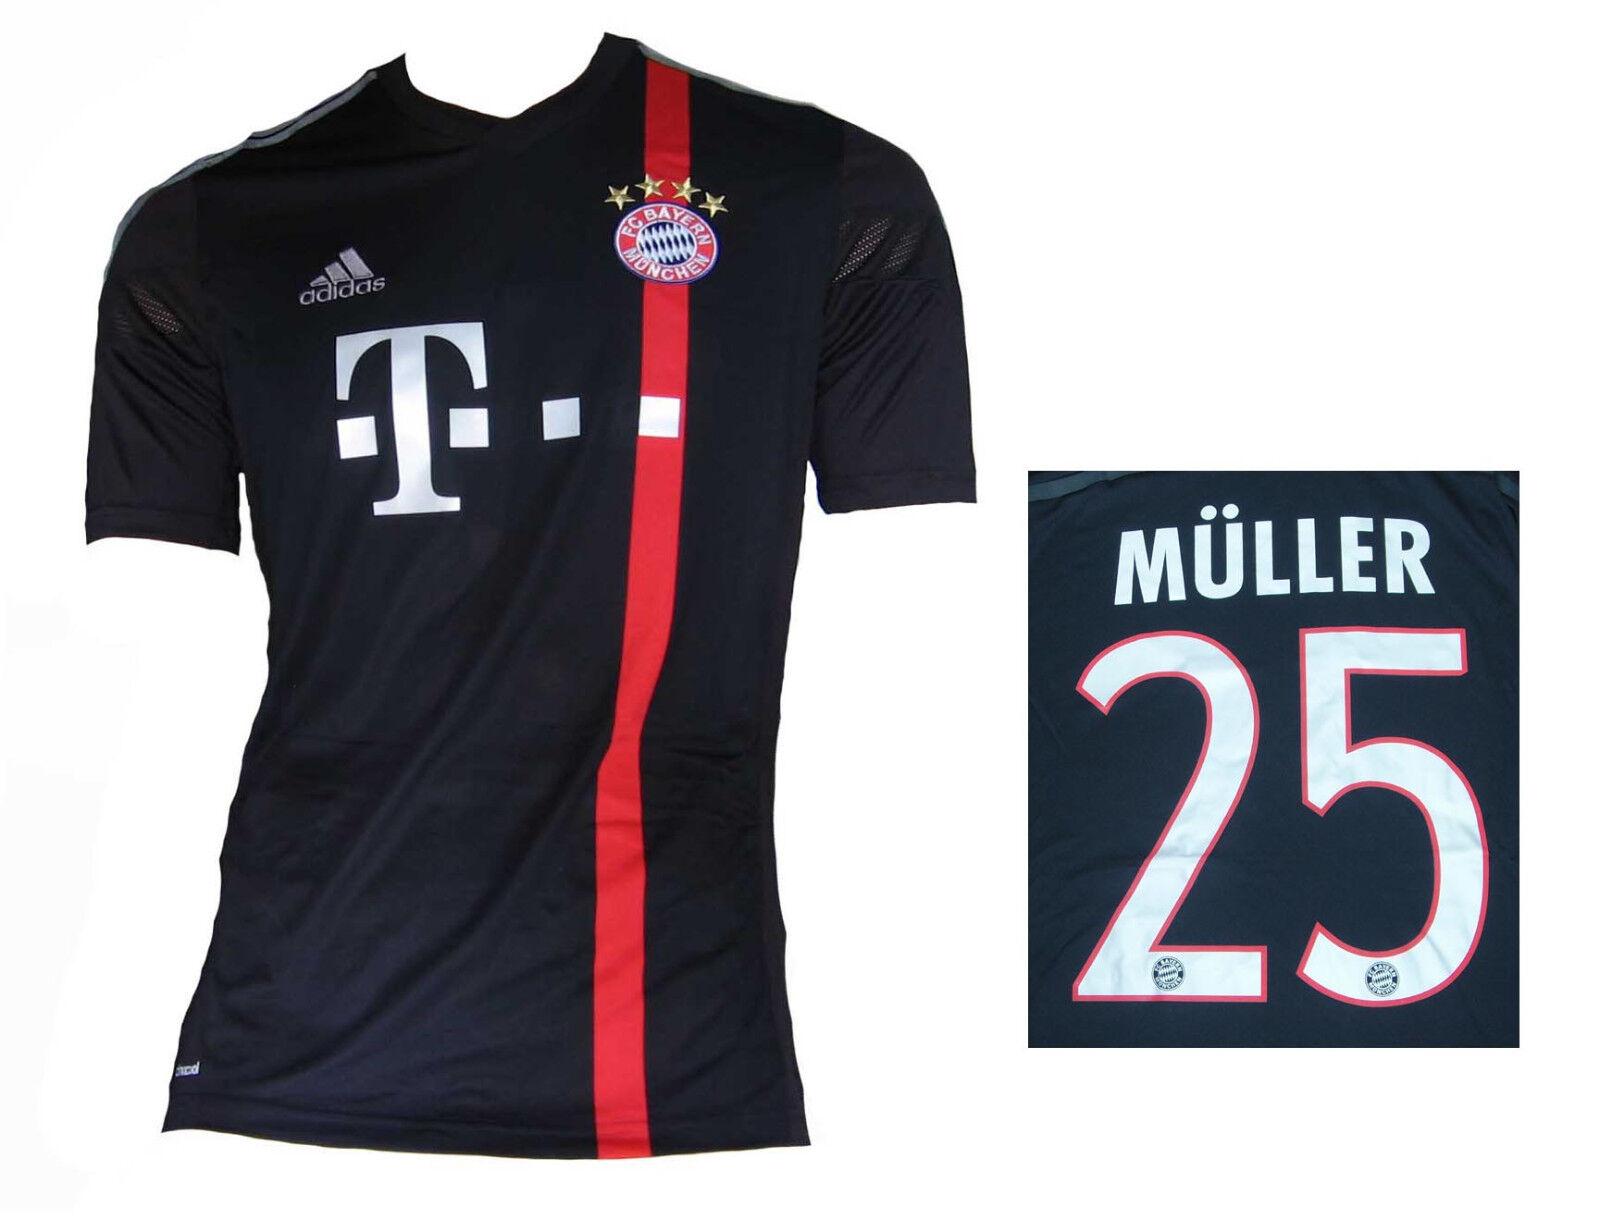 Bayern München Trikot Thomas Müller 2014 15 Adidas XL